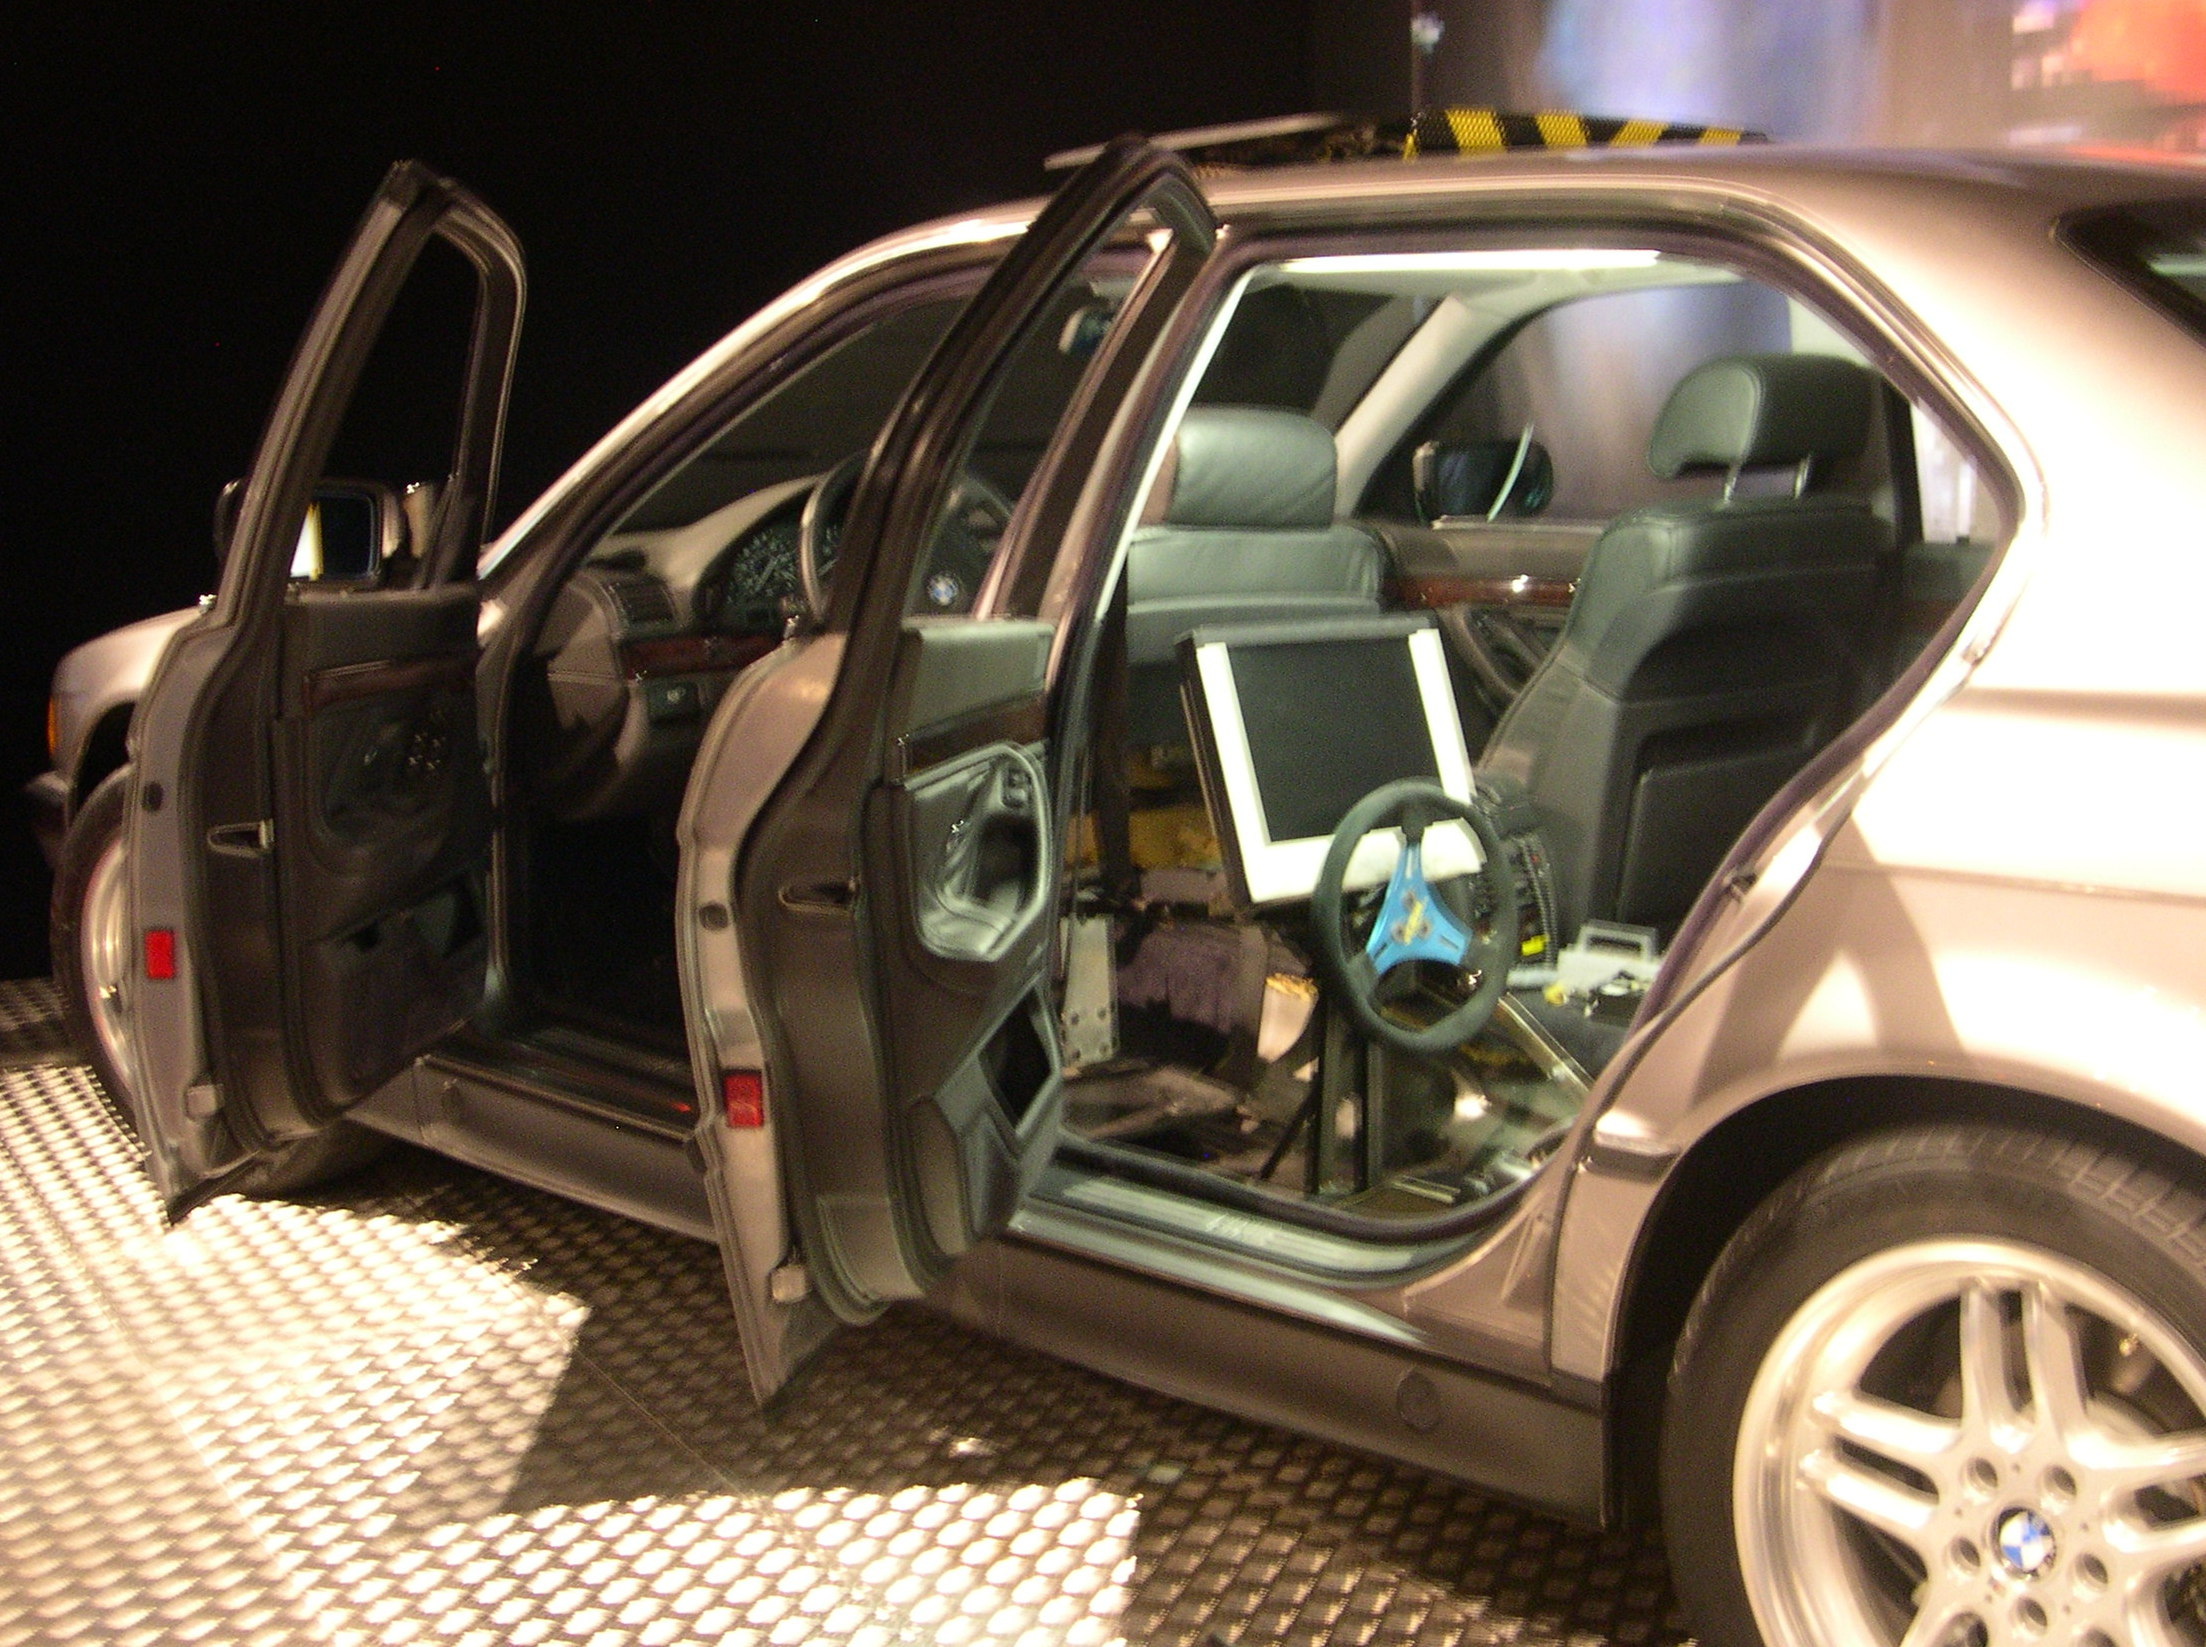 File:007-BMW.jpg - Wikimedia Commons